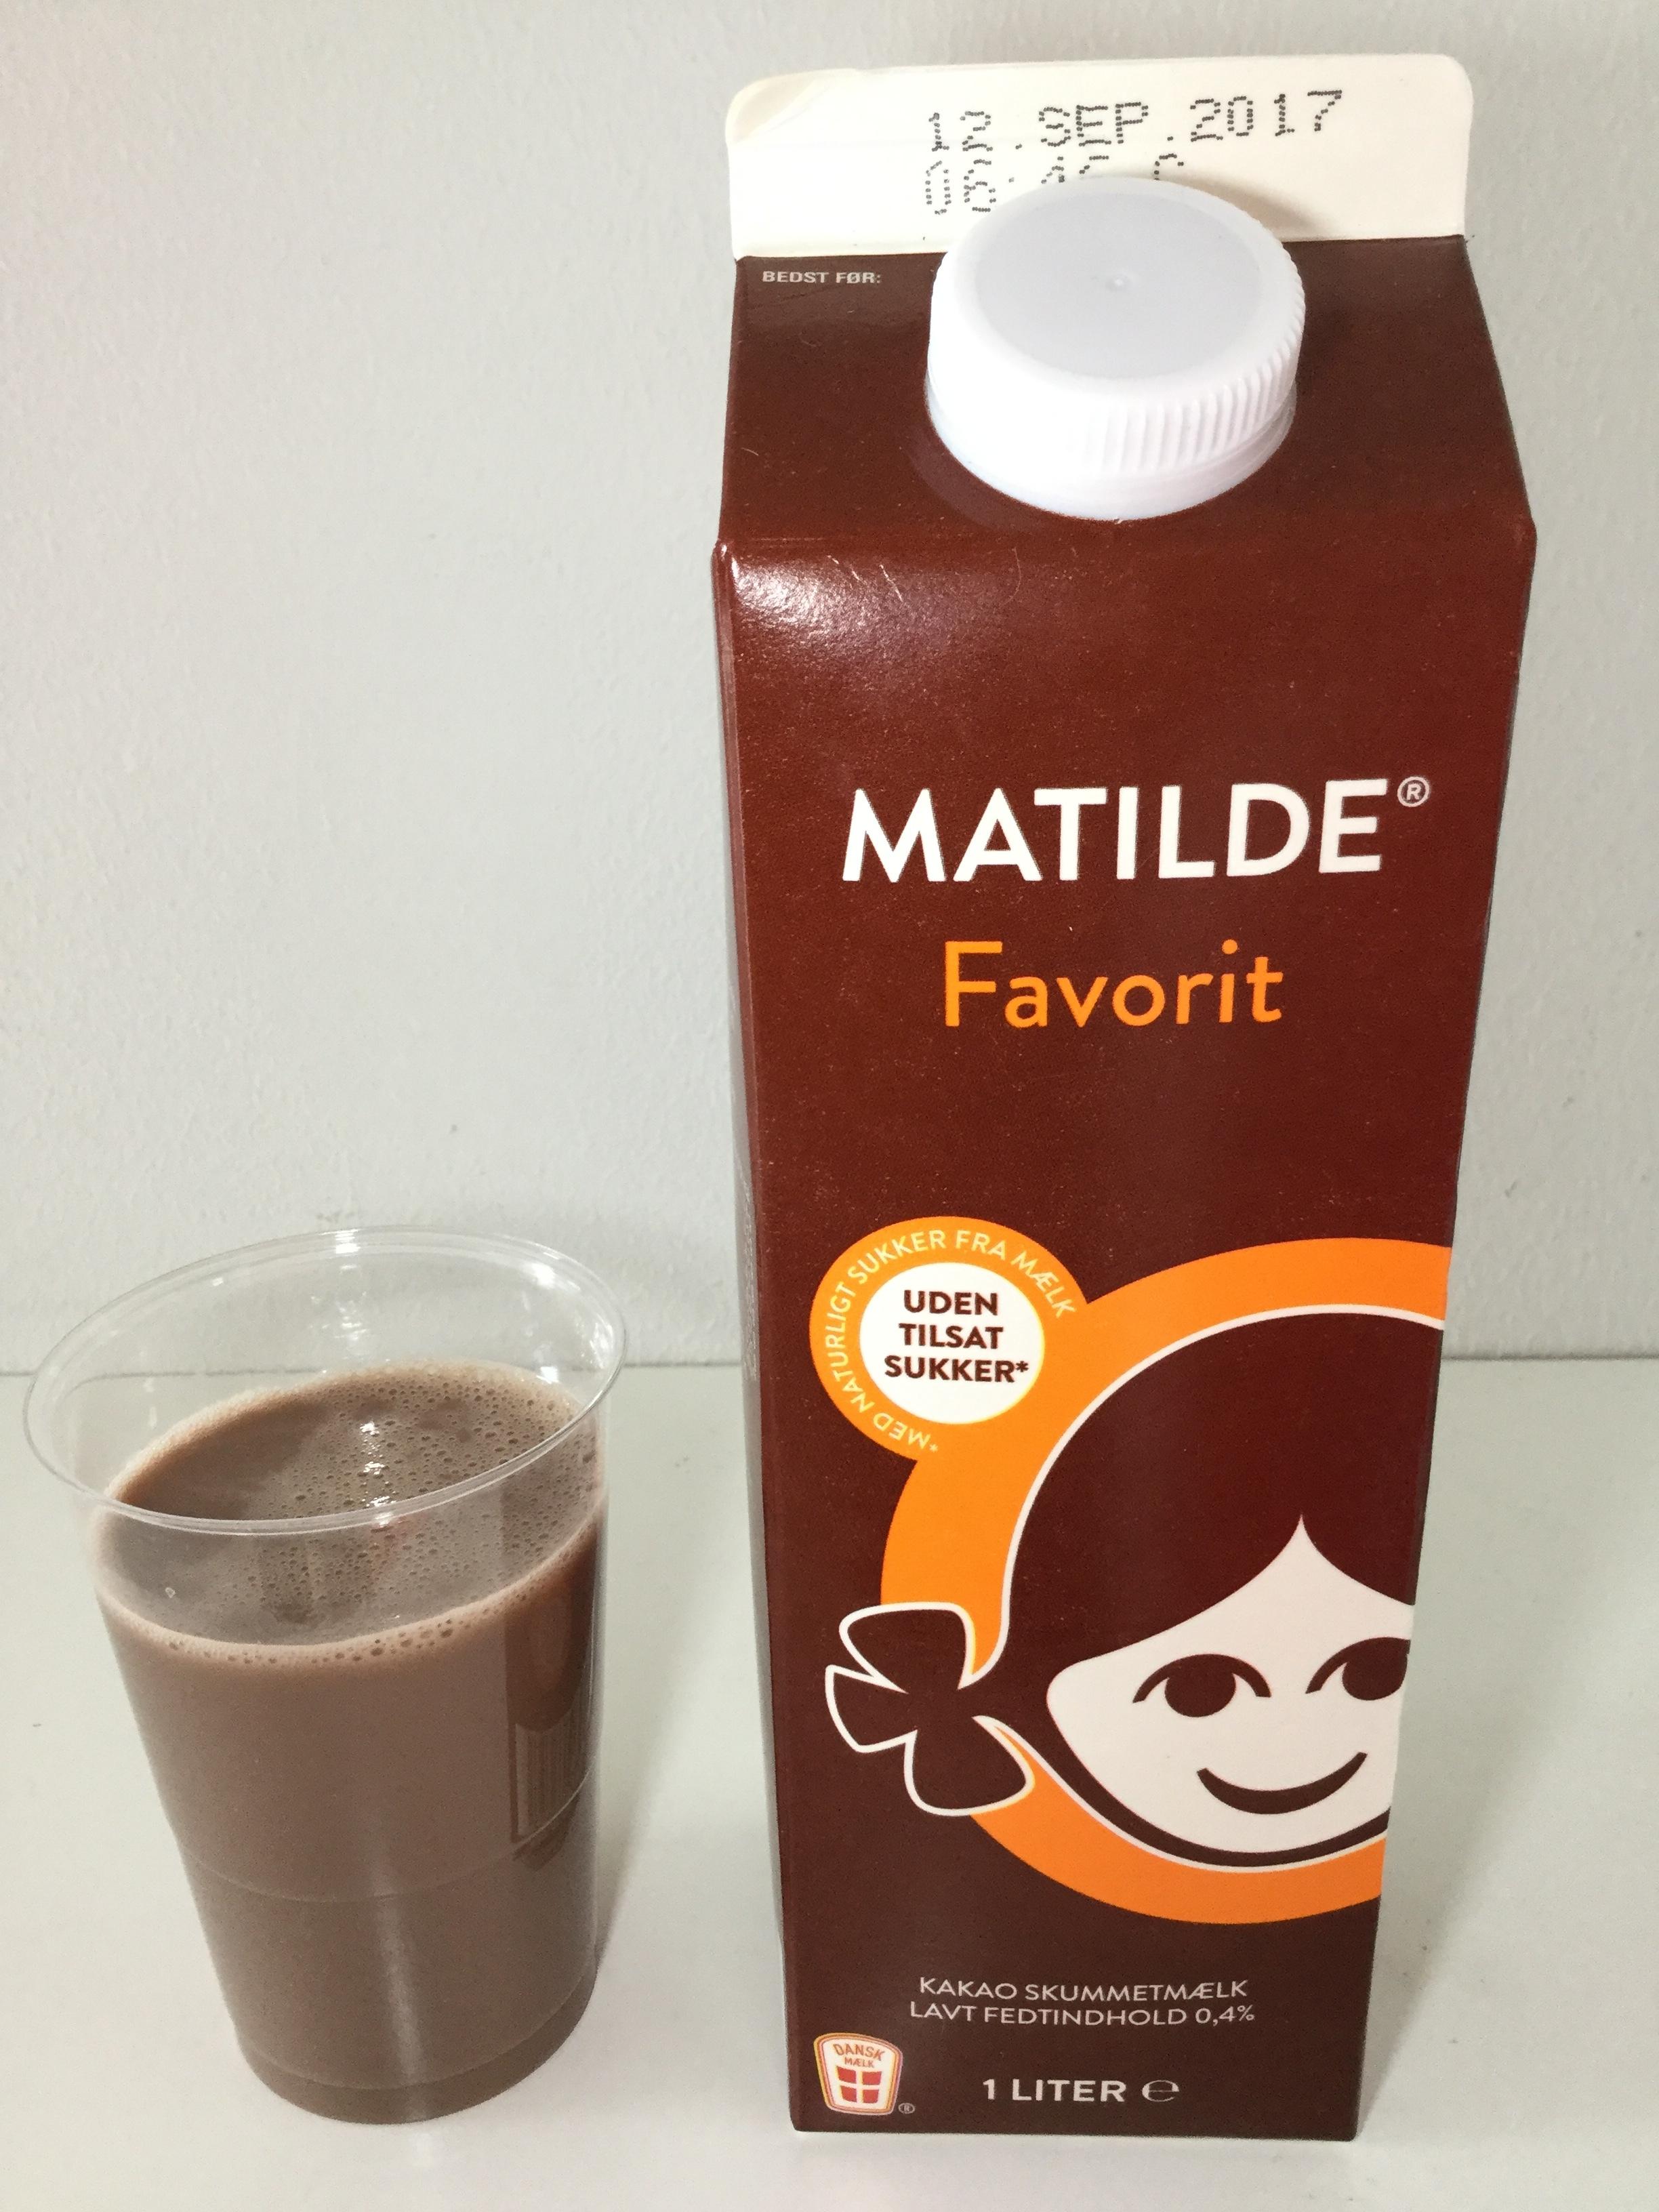 Matilde Favorit Kakao Skummetmaelk Cup